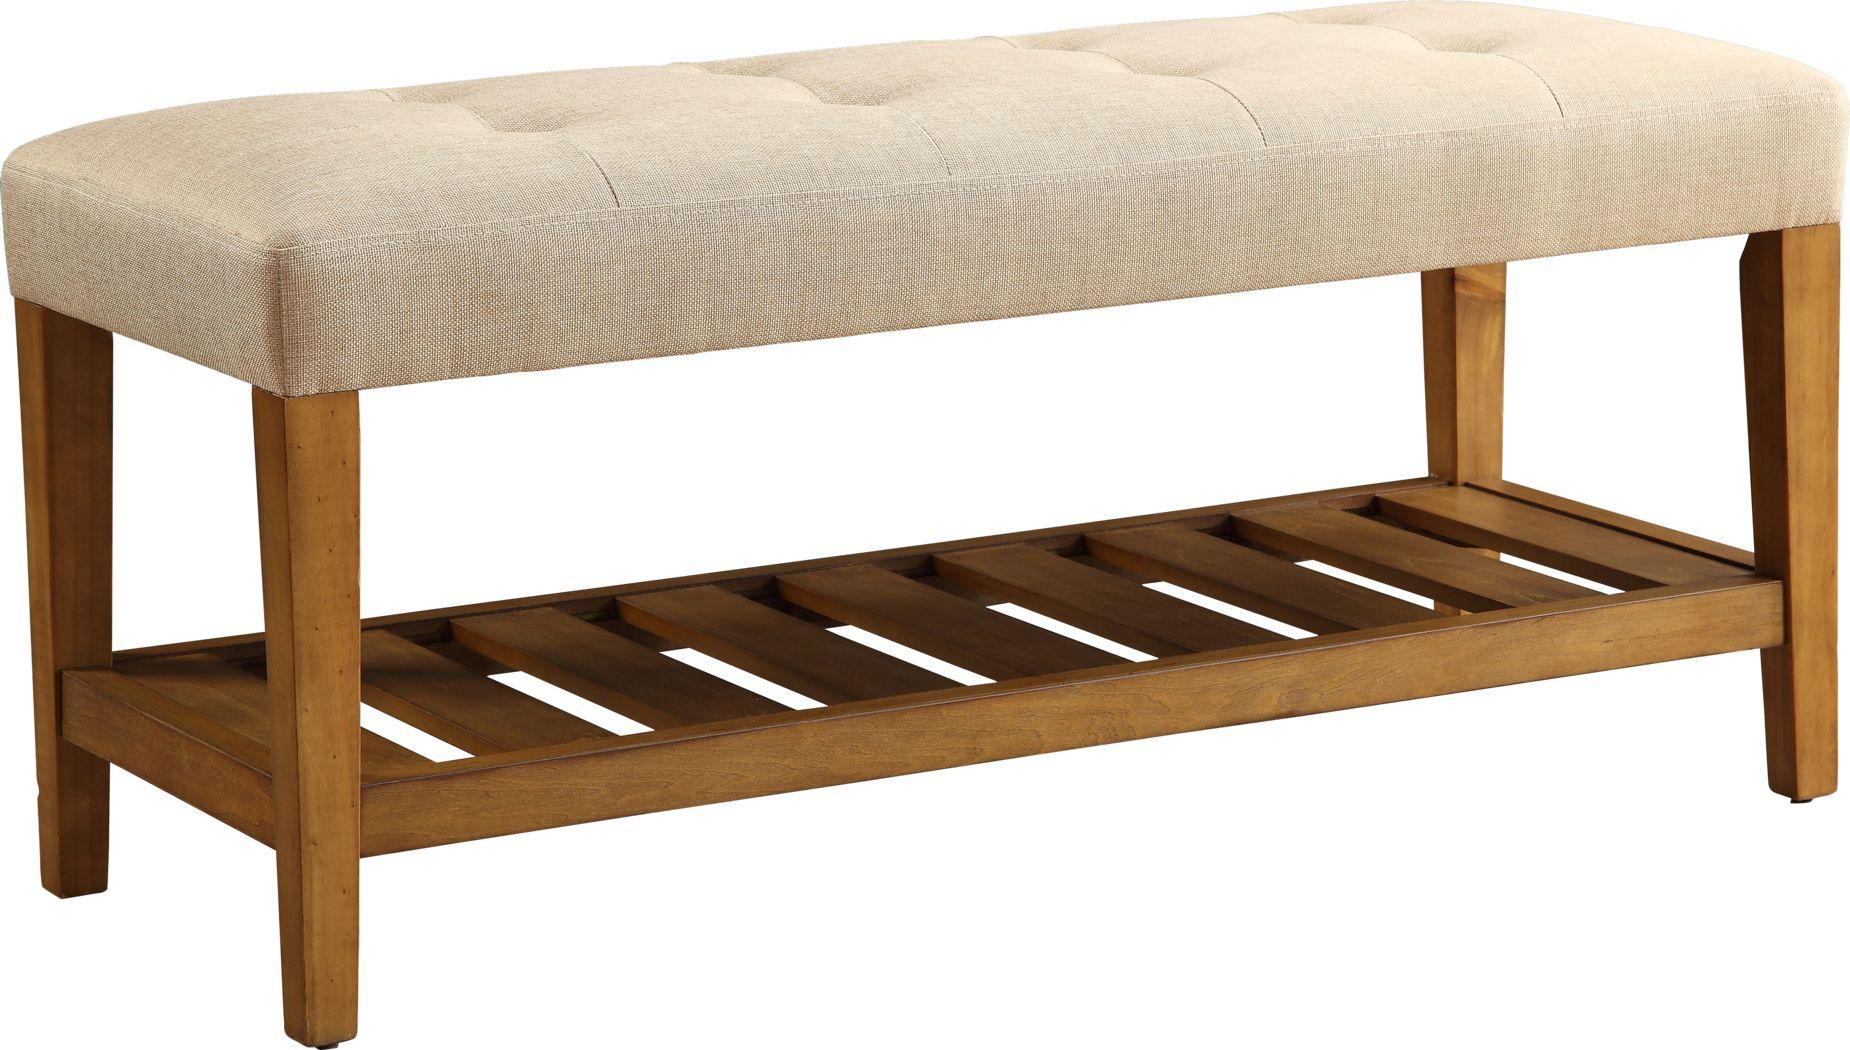 Cacia Beige Bench